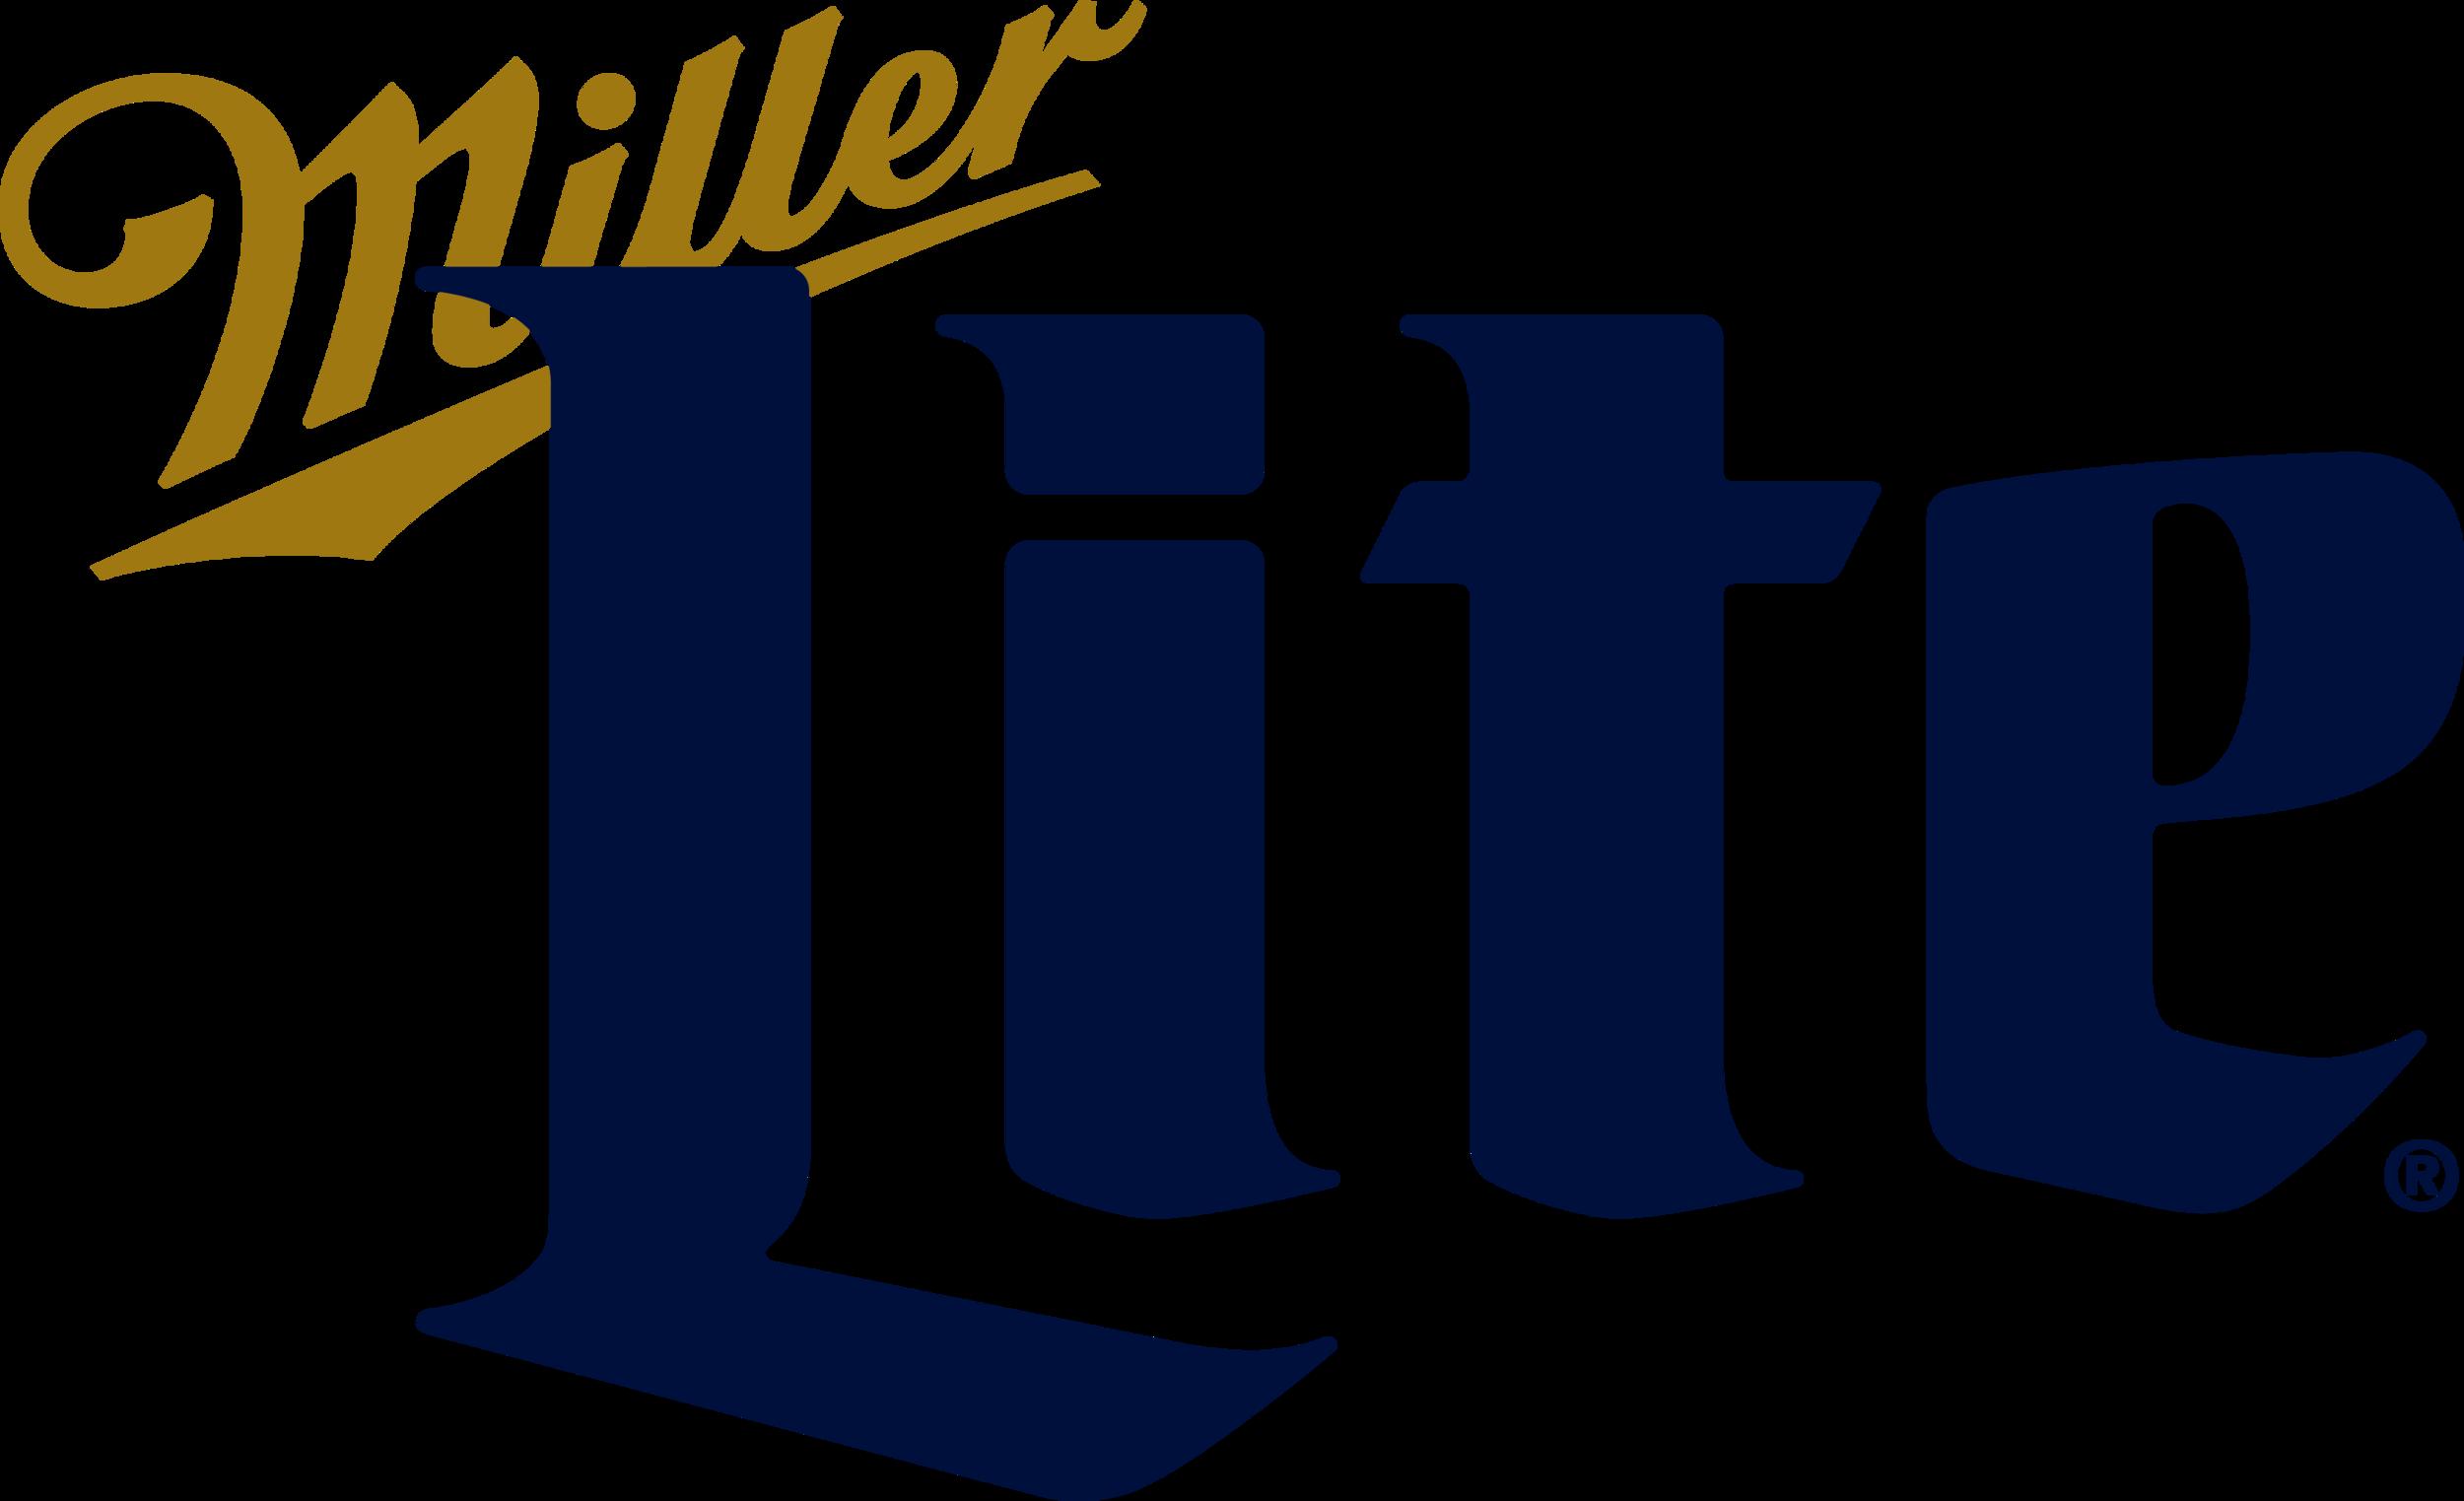 miller_lite_logo_01.png